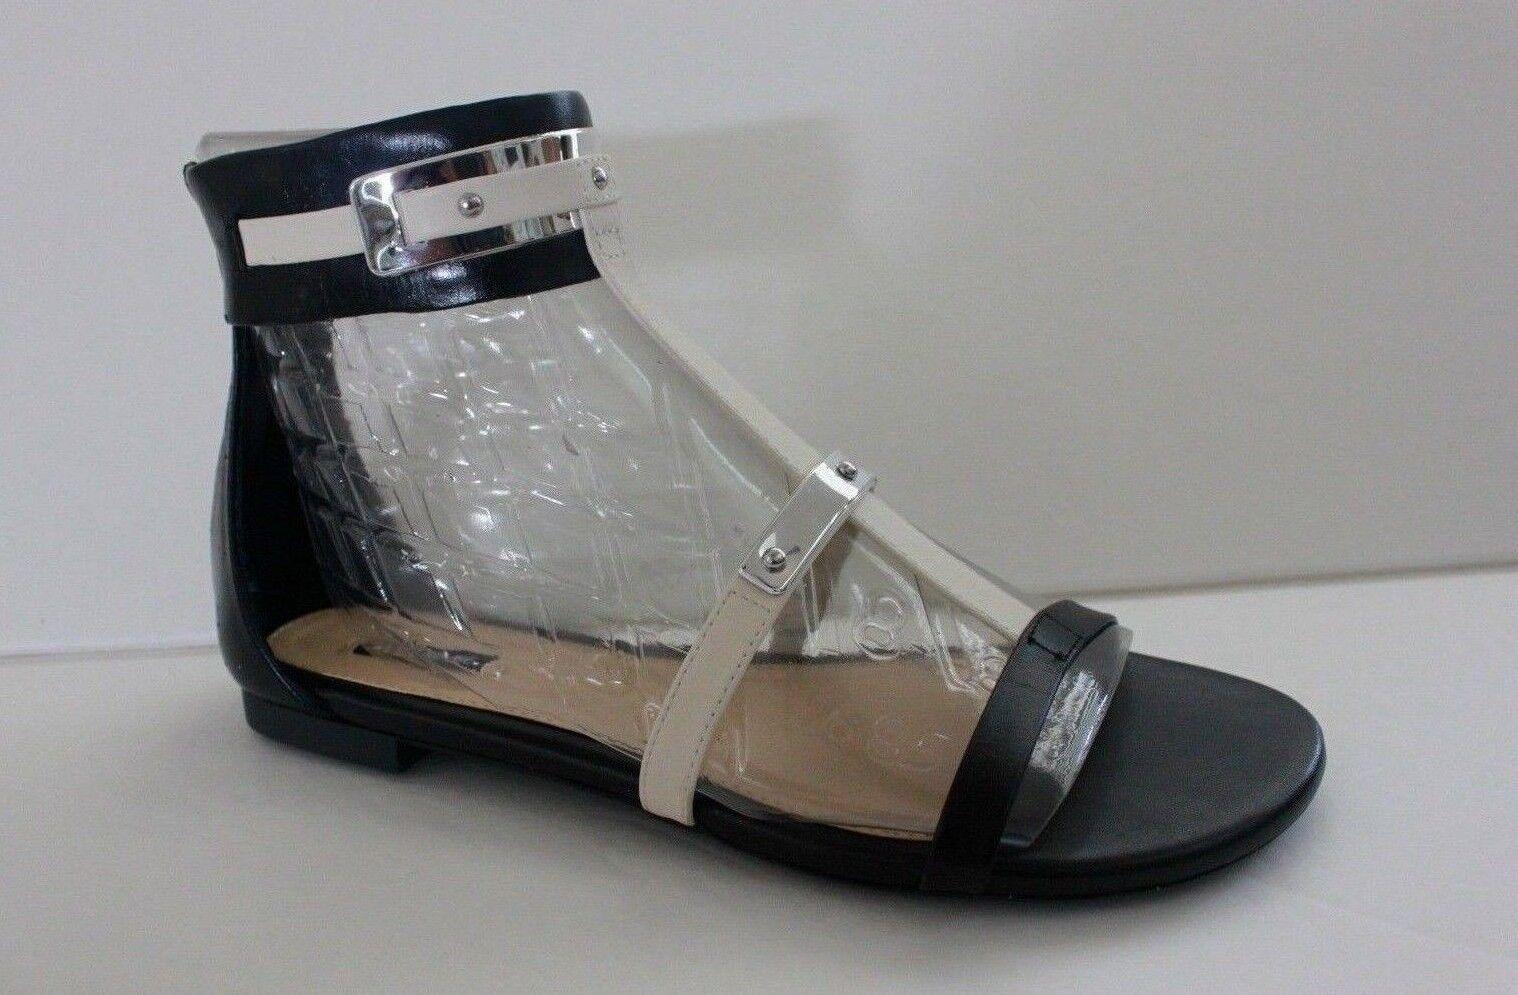 Alex Marie Femme Chaussure Taille 8 M Noir en Cuir Blanc Sandales Plates Chaussure NEW IN BOX